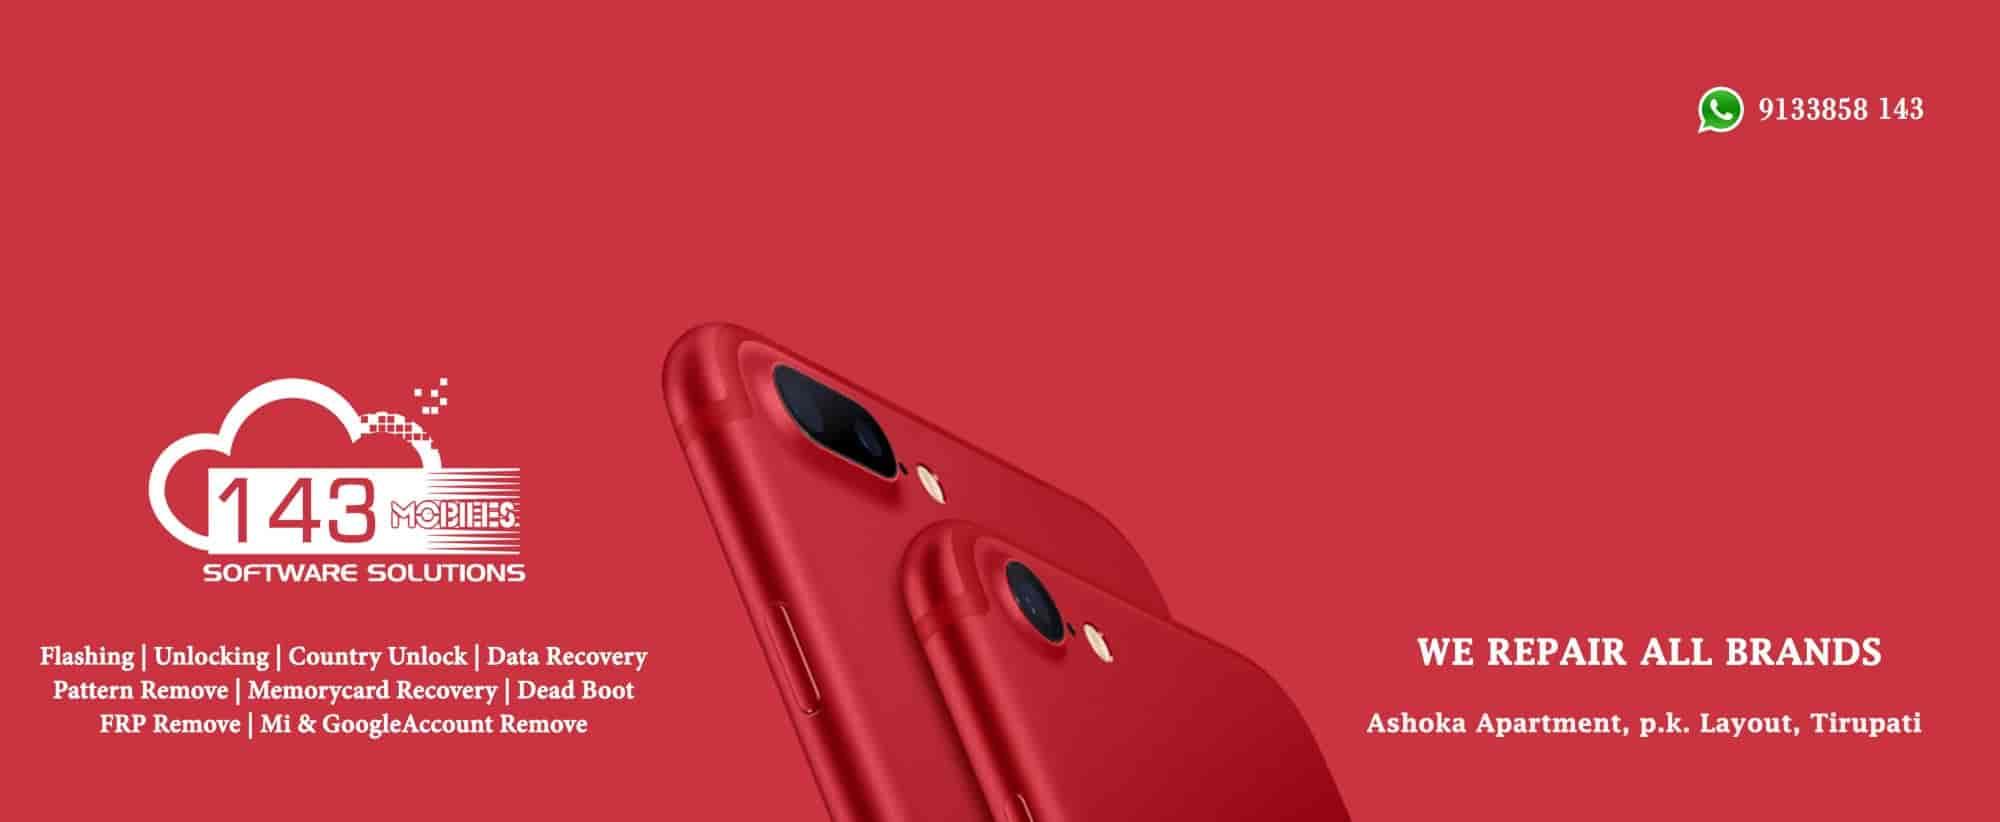 143 Mobiles Photos, Pk Layout, Tirupati - Mobile Phone Service Providers ...